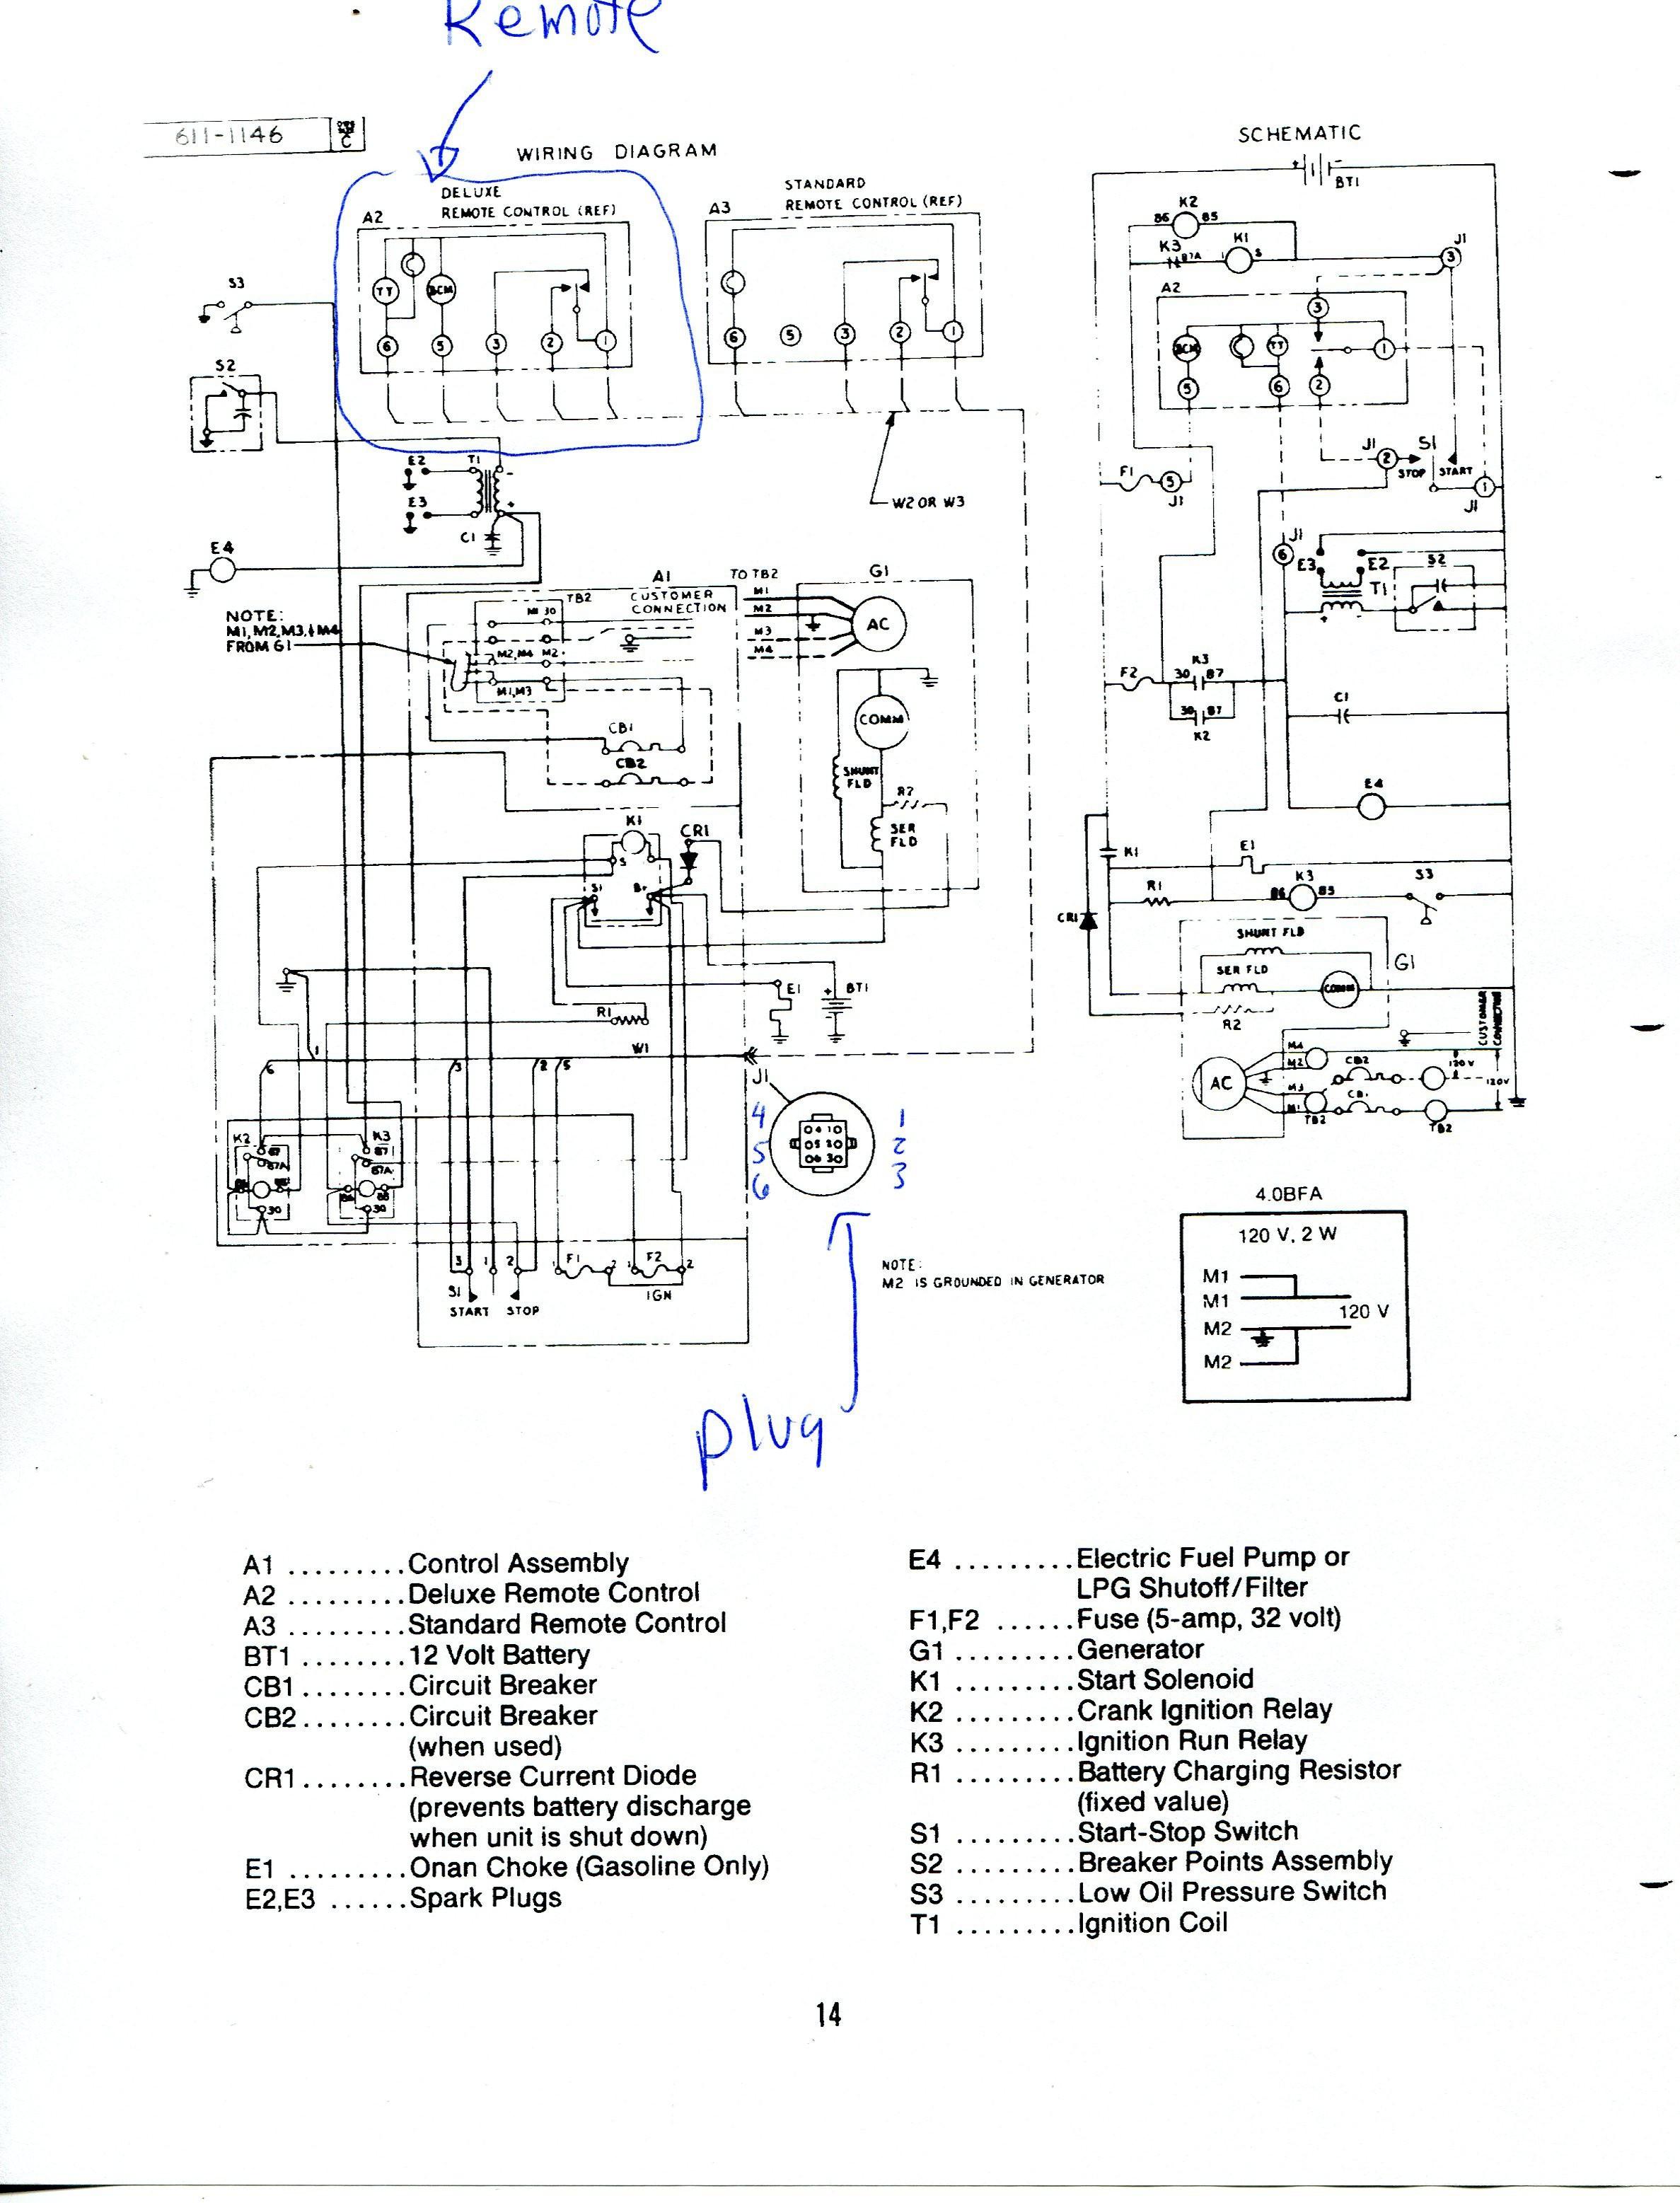 Wiring Diagram an Generator Valid Luxury An Generator Electric Choke Circuit Gift Simple Wiring